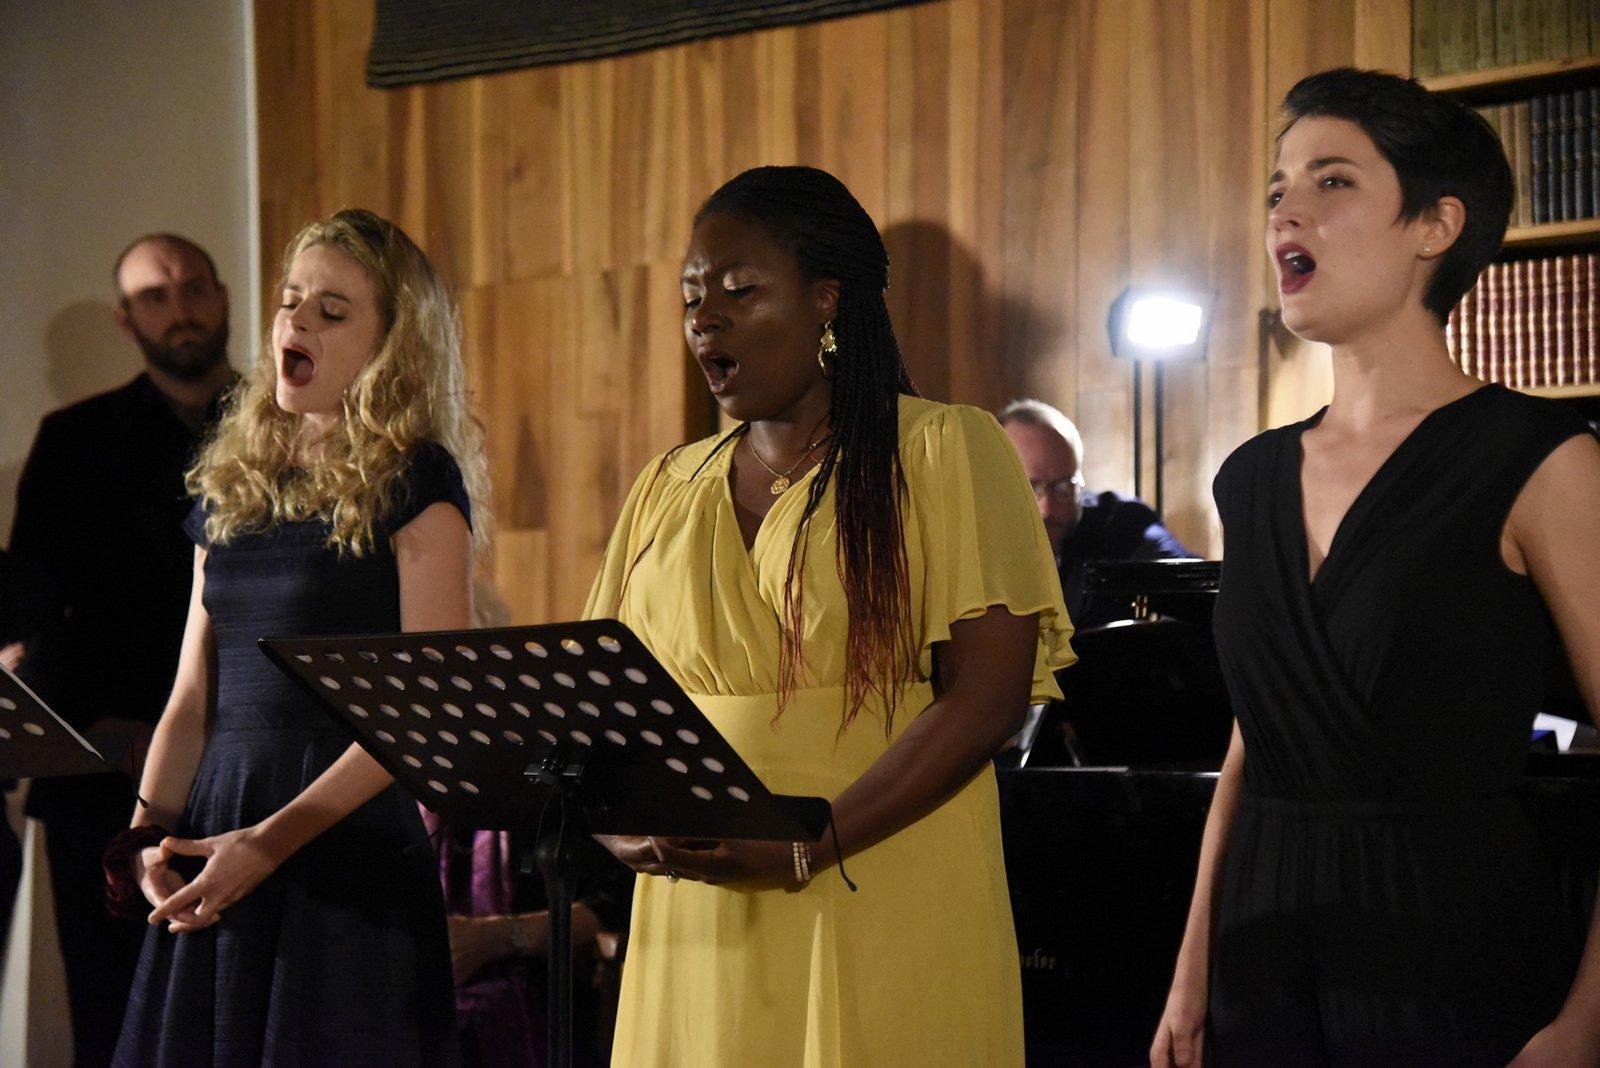 Trio Caroline, Cyrielle, Natalie par O. Monoyez